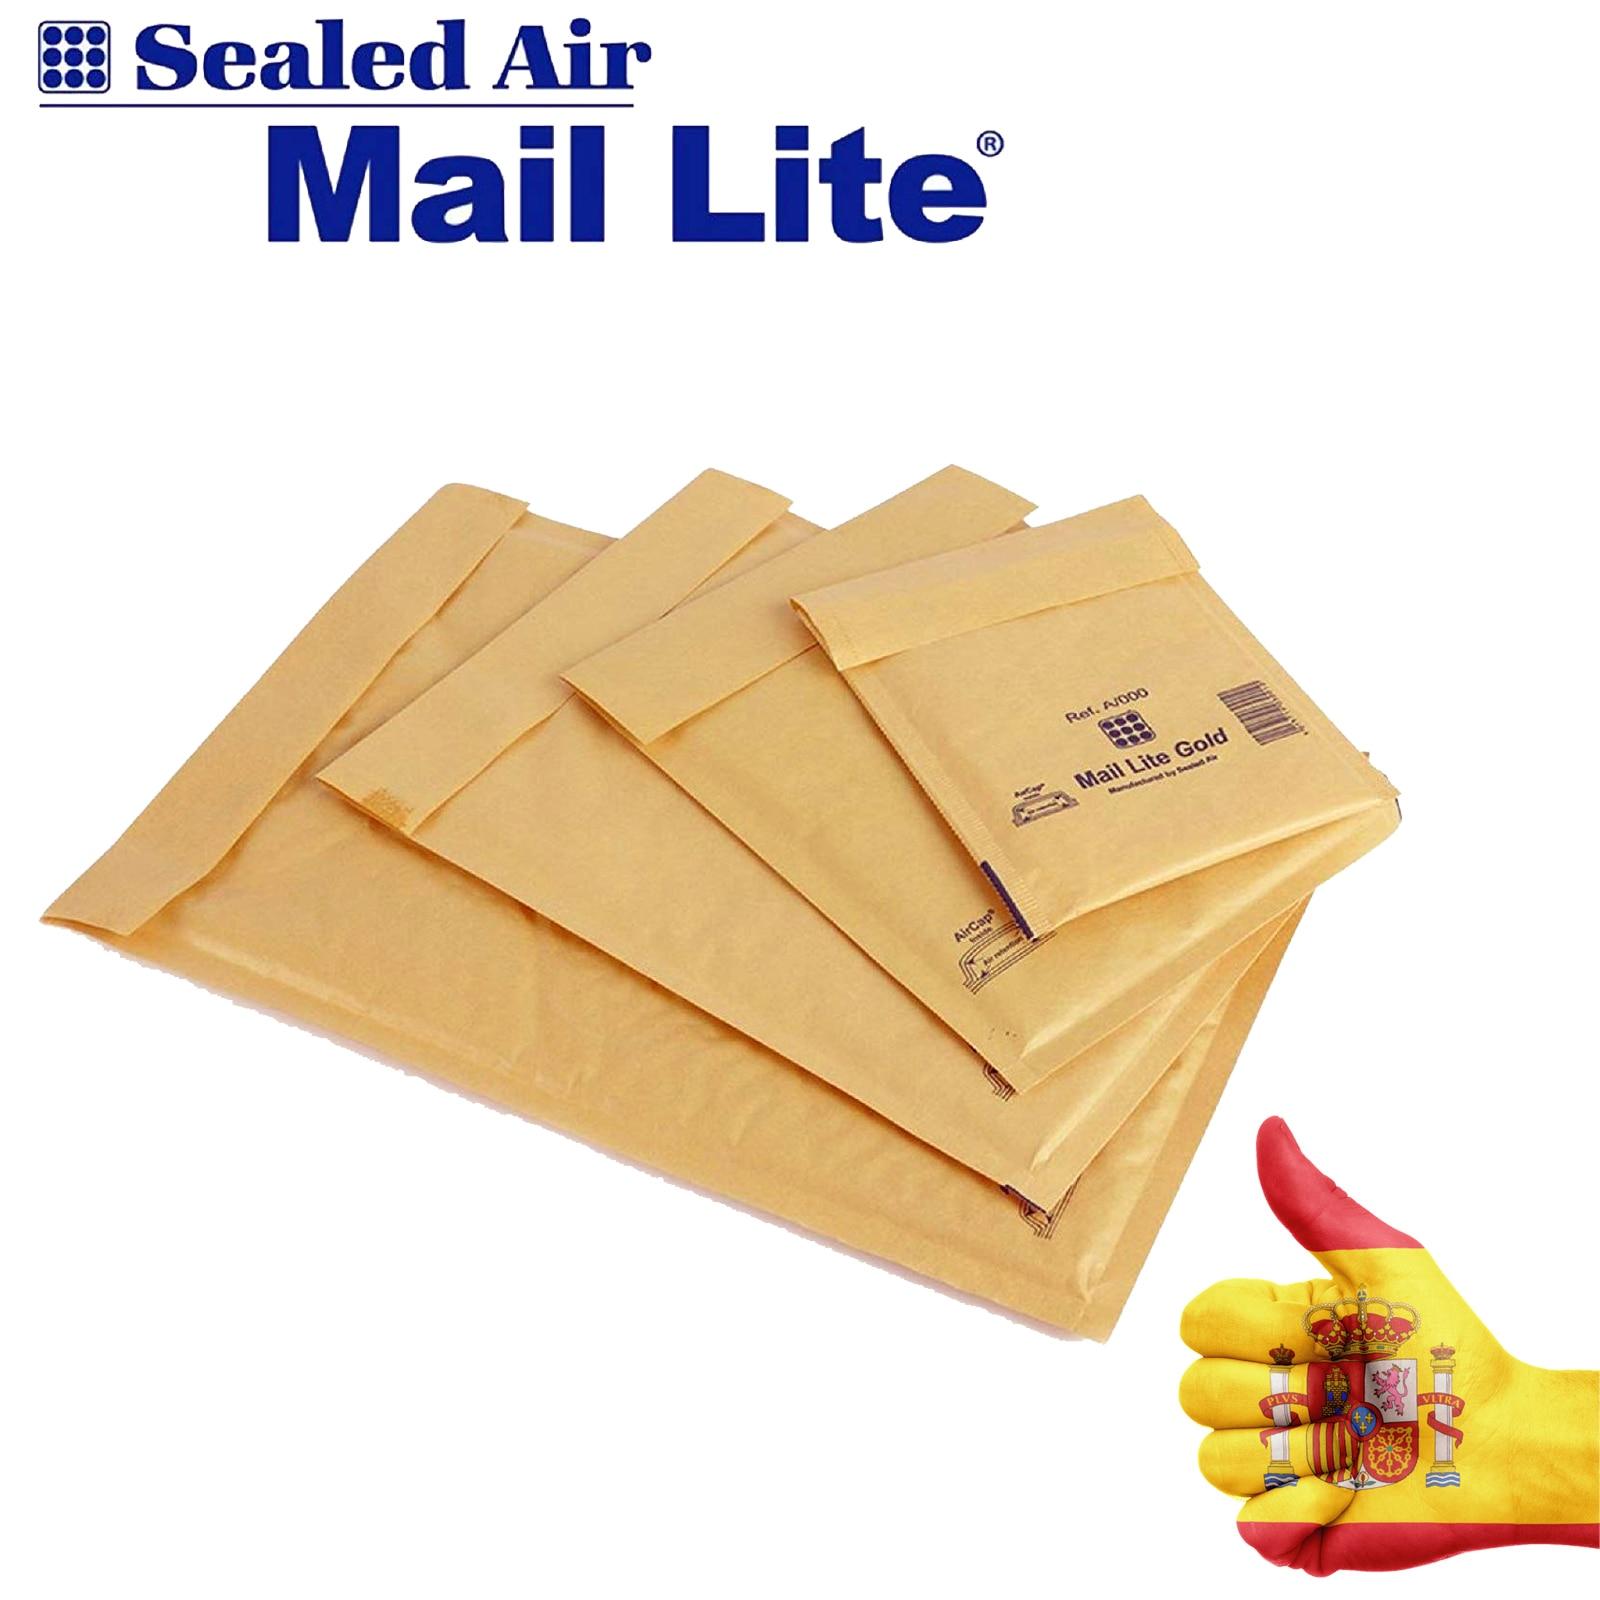 MailLite®BOX 100 ENVELOPE QUILTING MARRON Bubble Lined Paper Bags Mail Envelope Bag Kraft Bag CHOOSE YOUR MEASURE